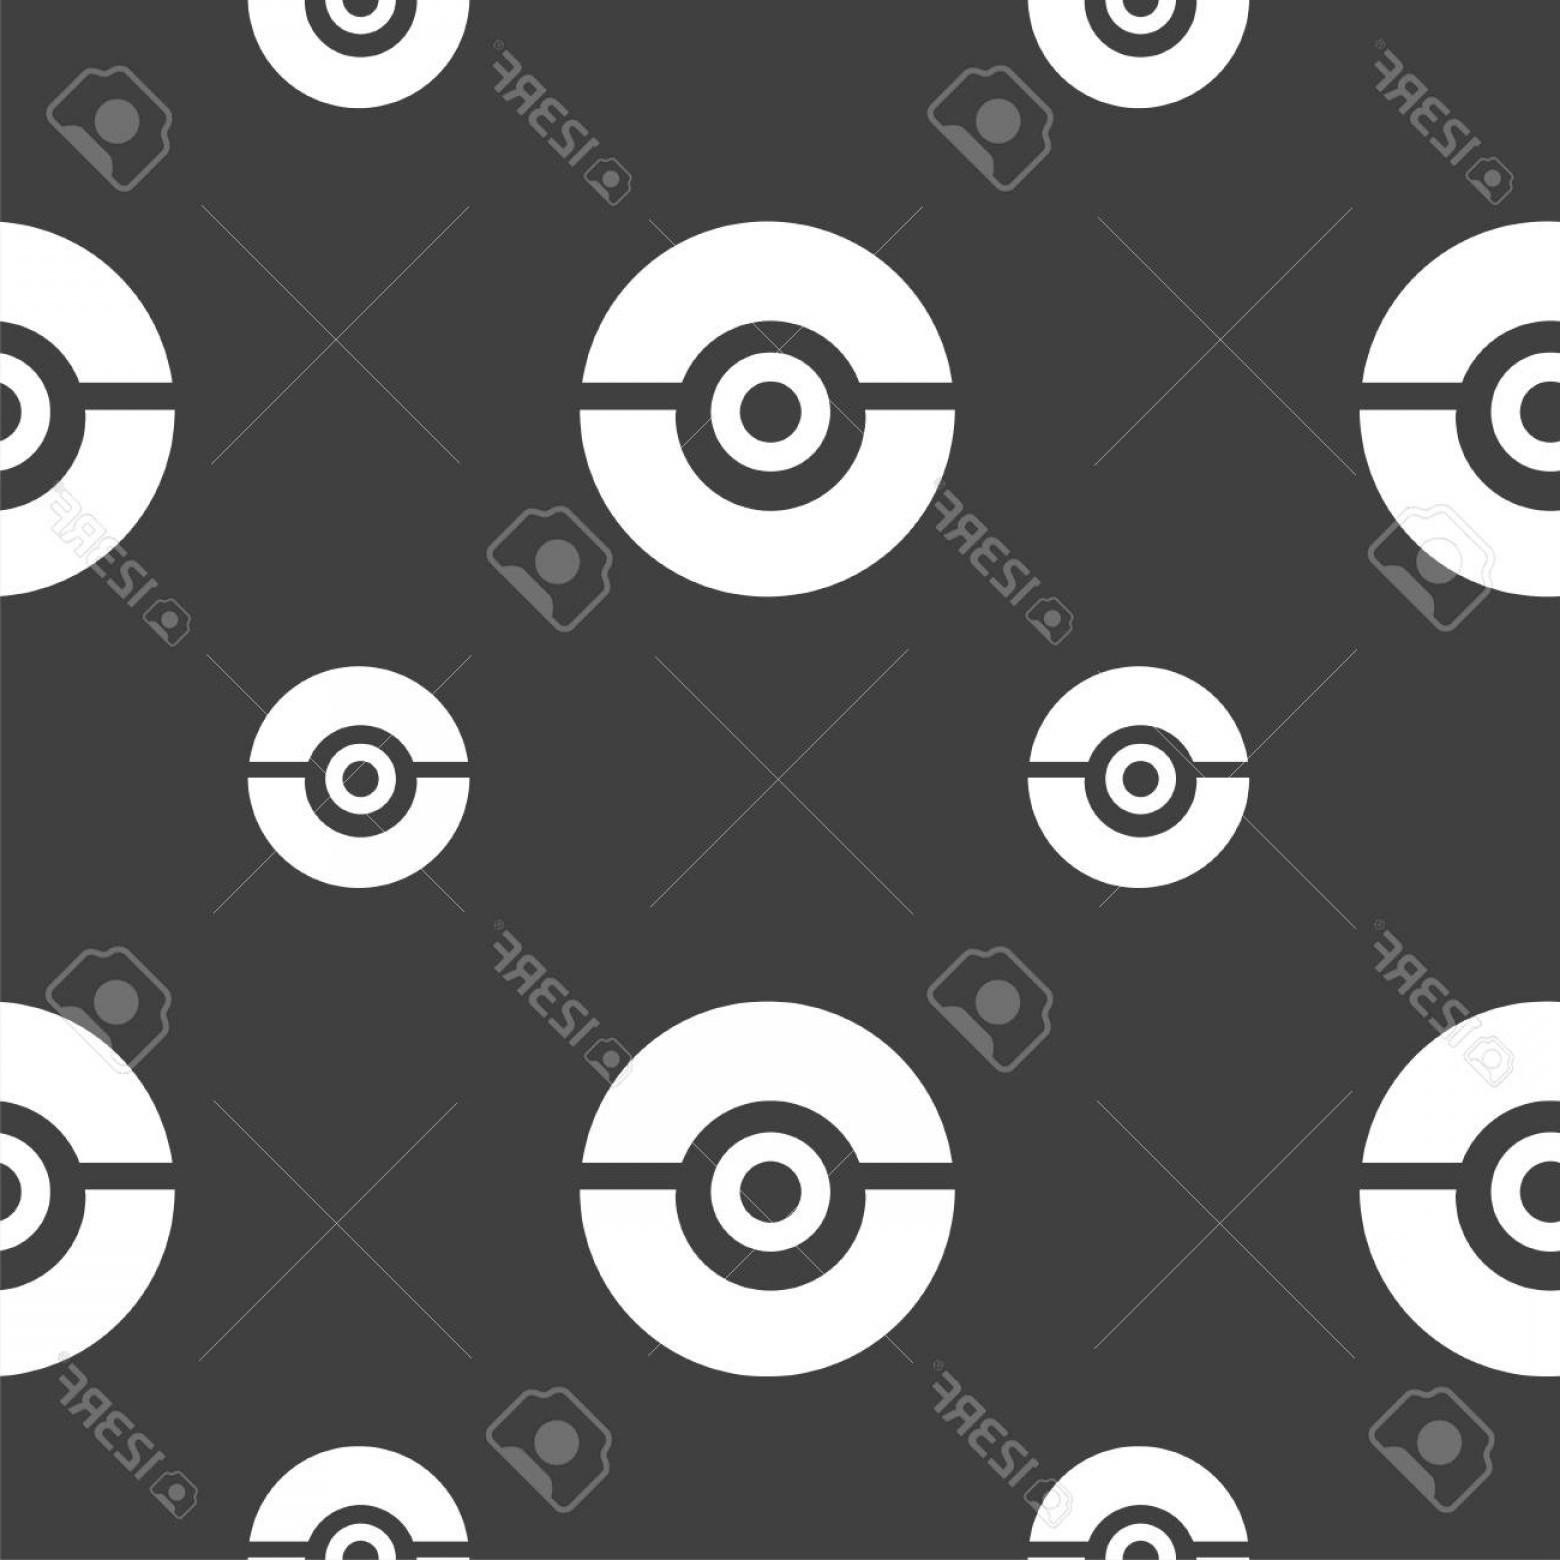 1560x1560 Photostock Vector Pokeball Icon Sign Seamless Pattern On A Gray